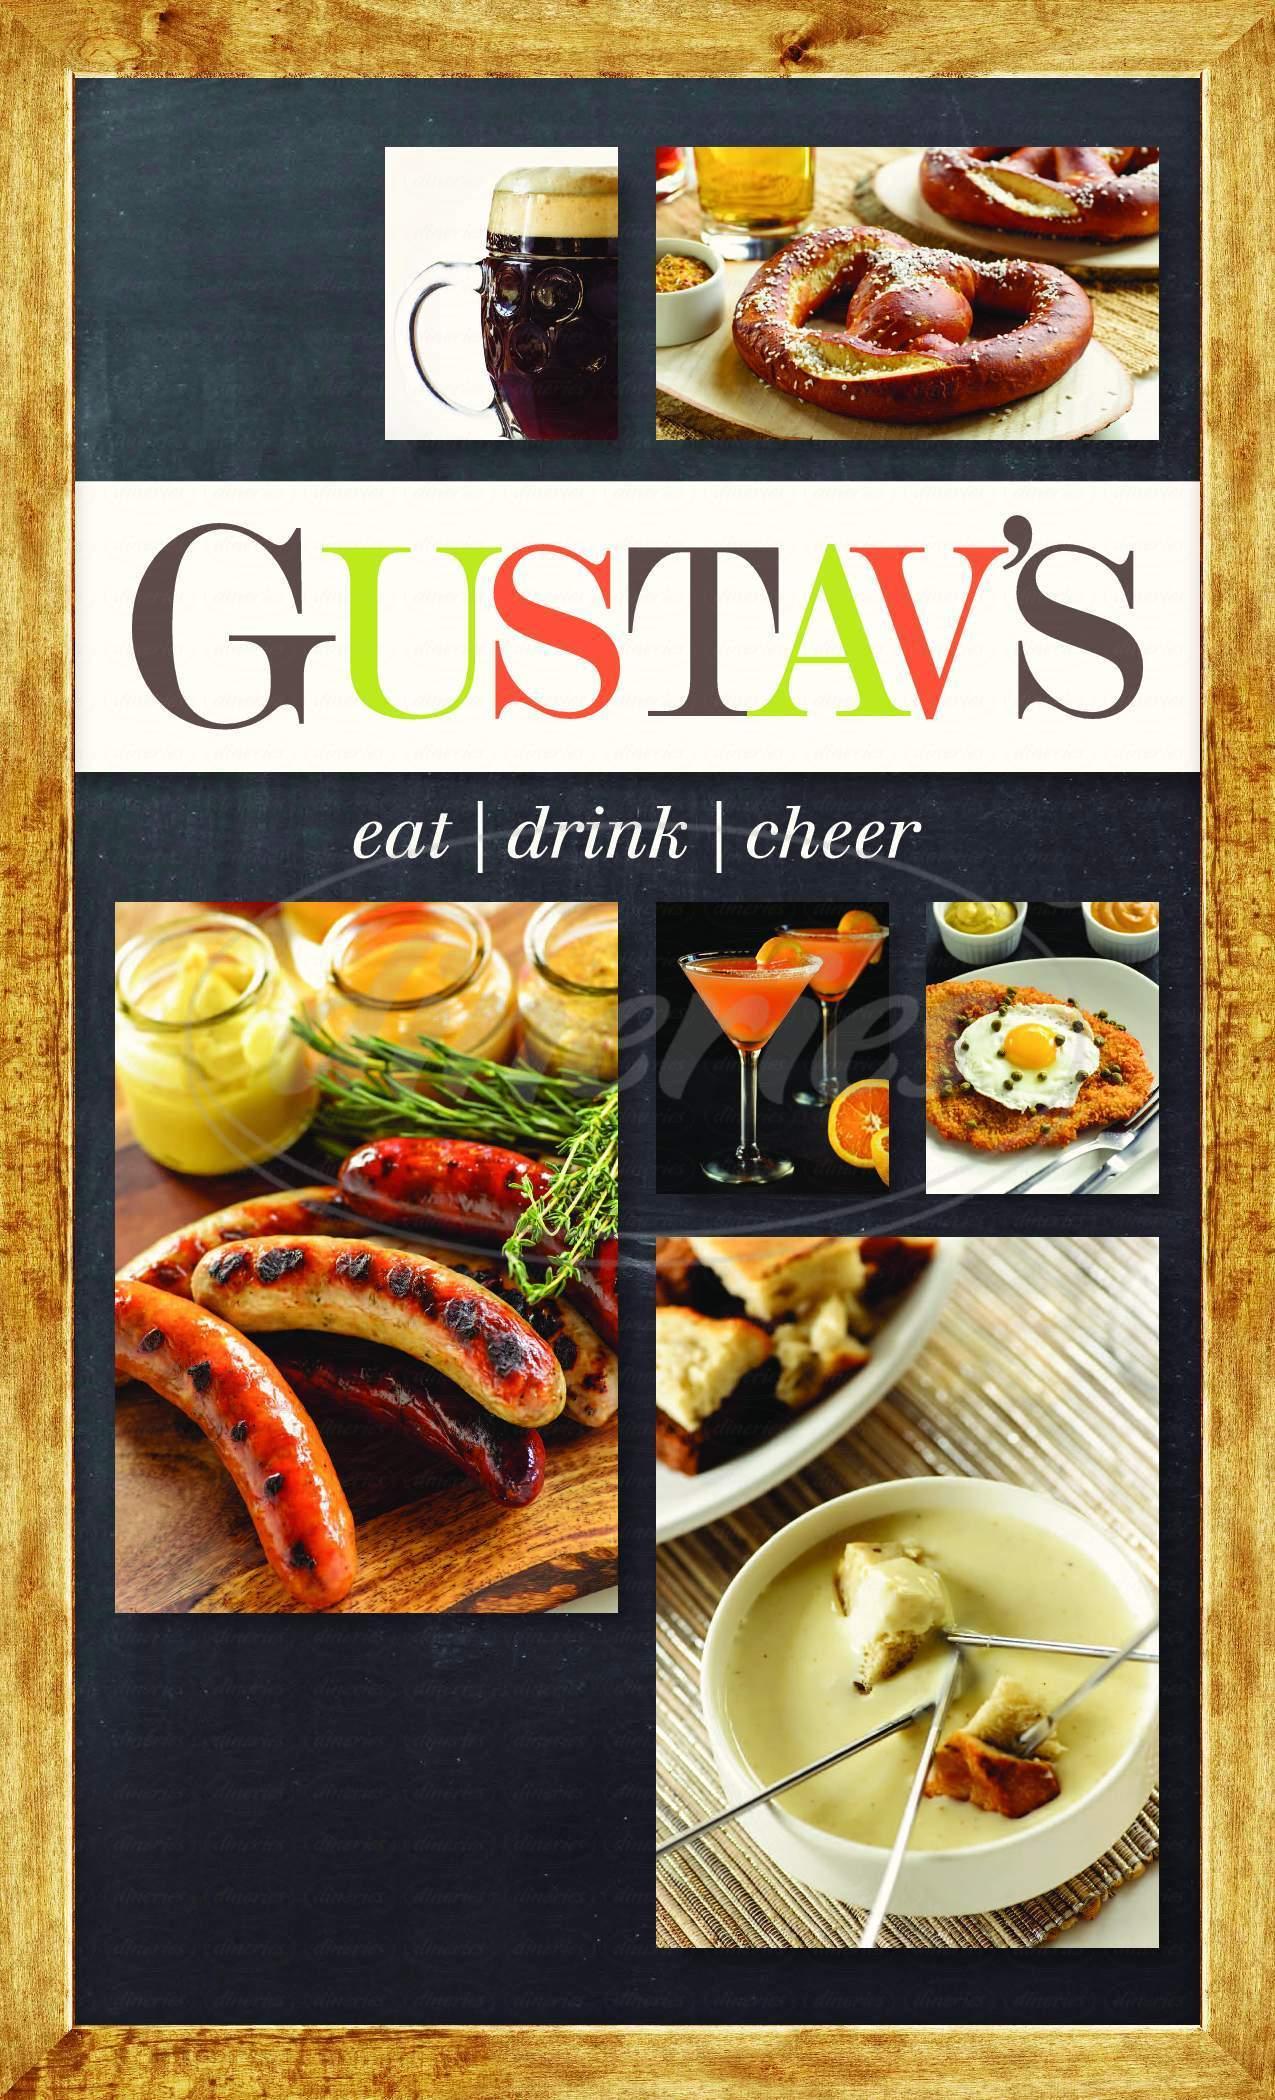 menu for Gustav's Pub & Grill